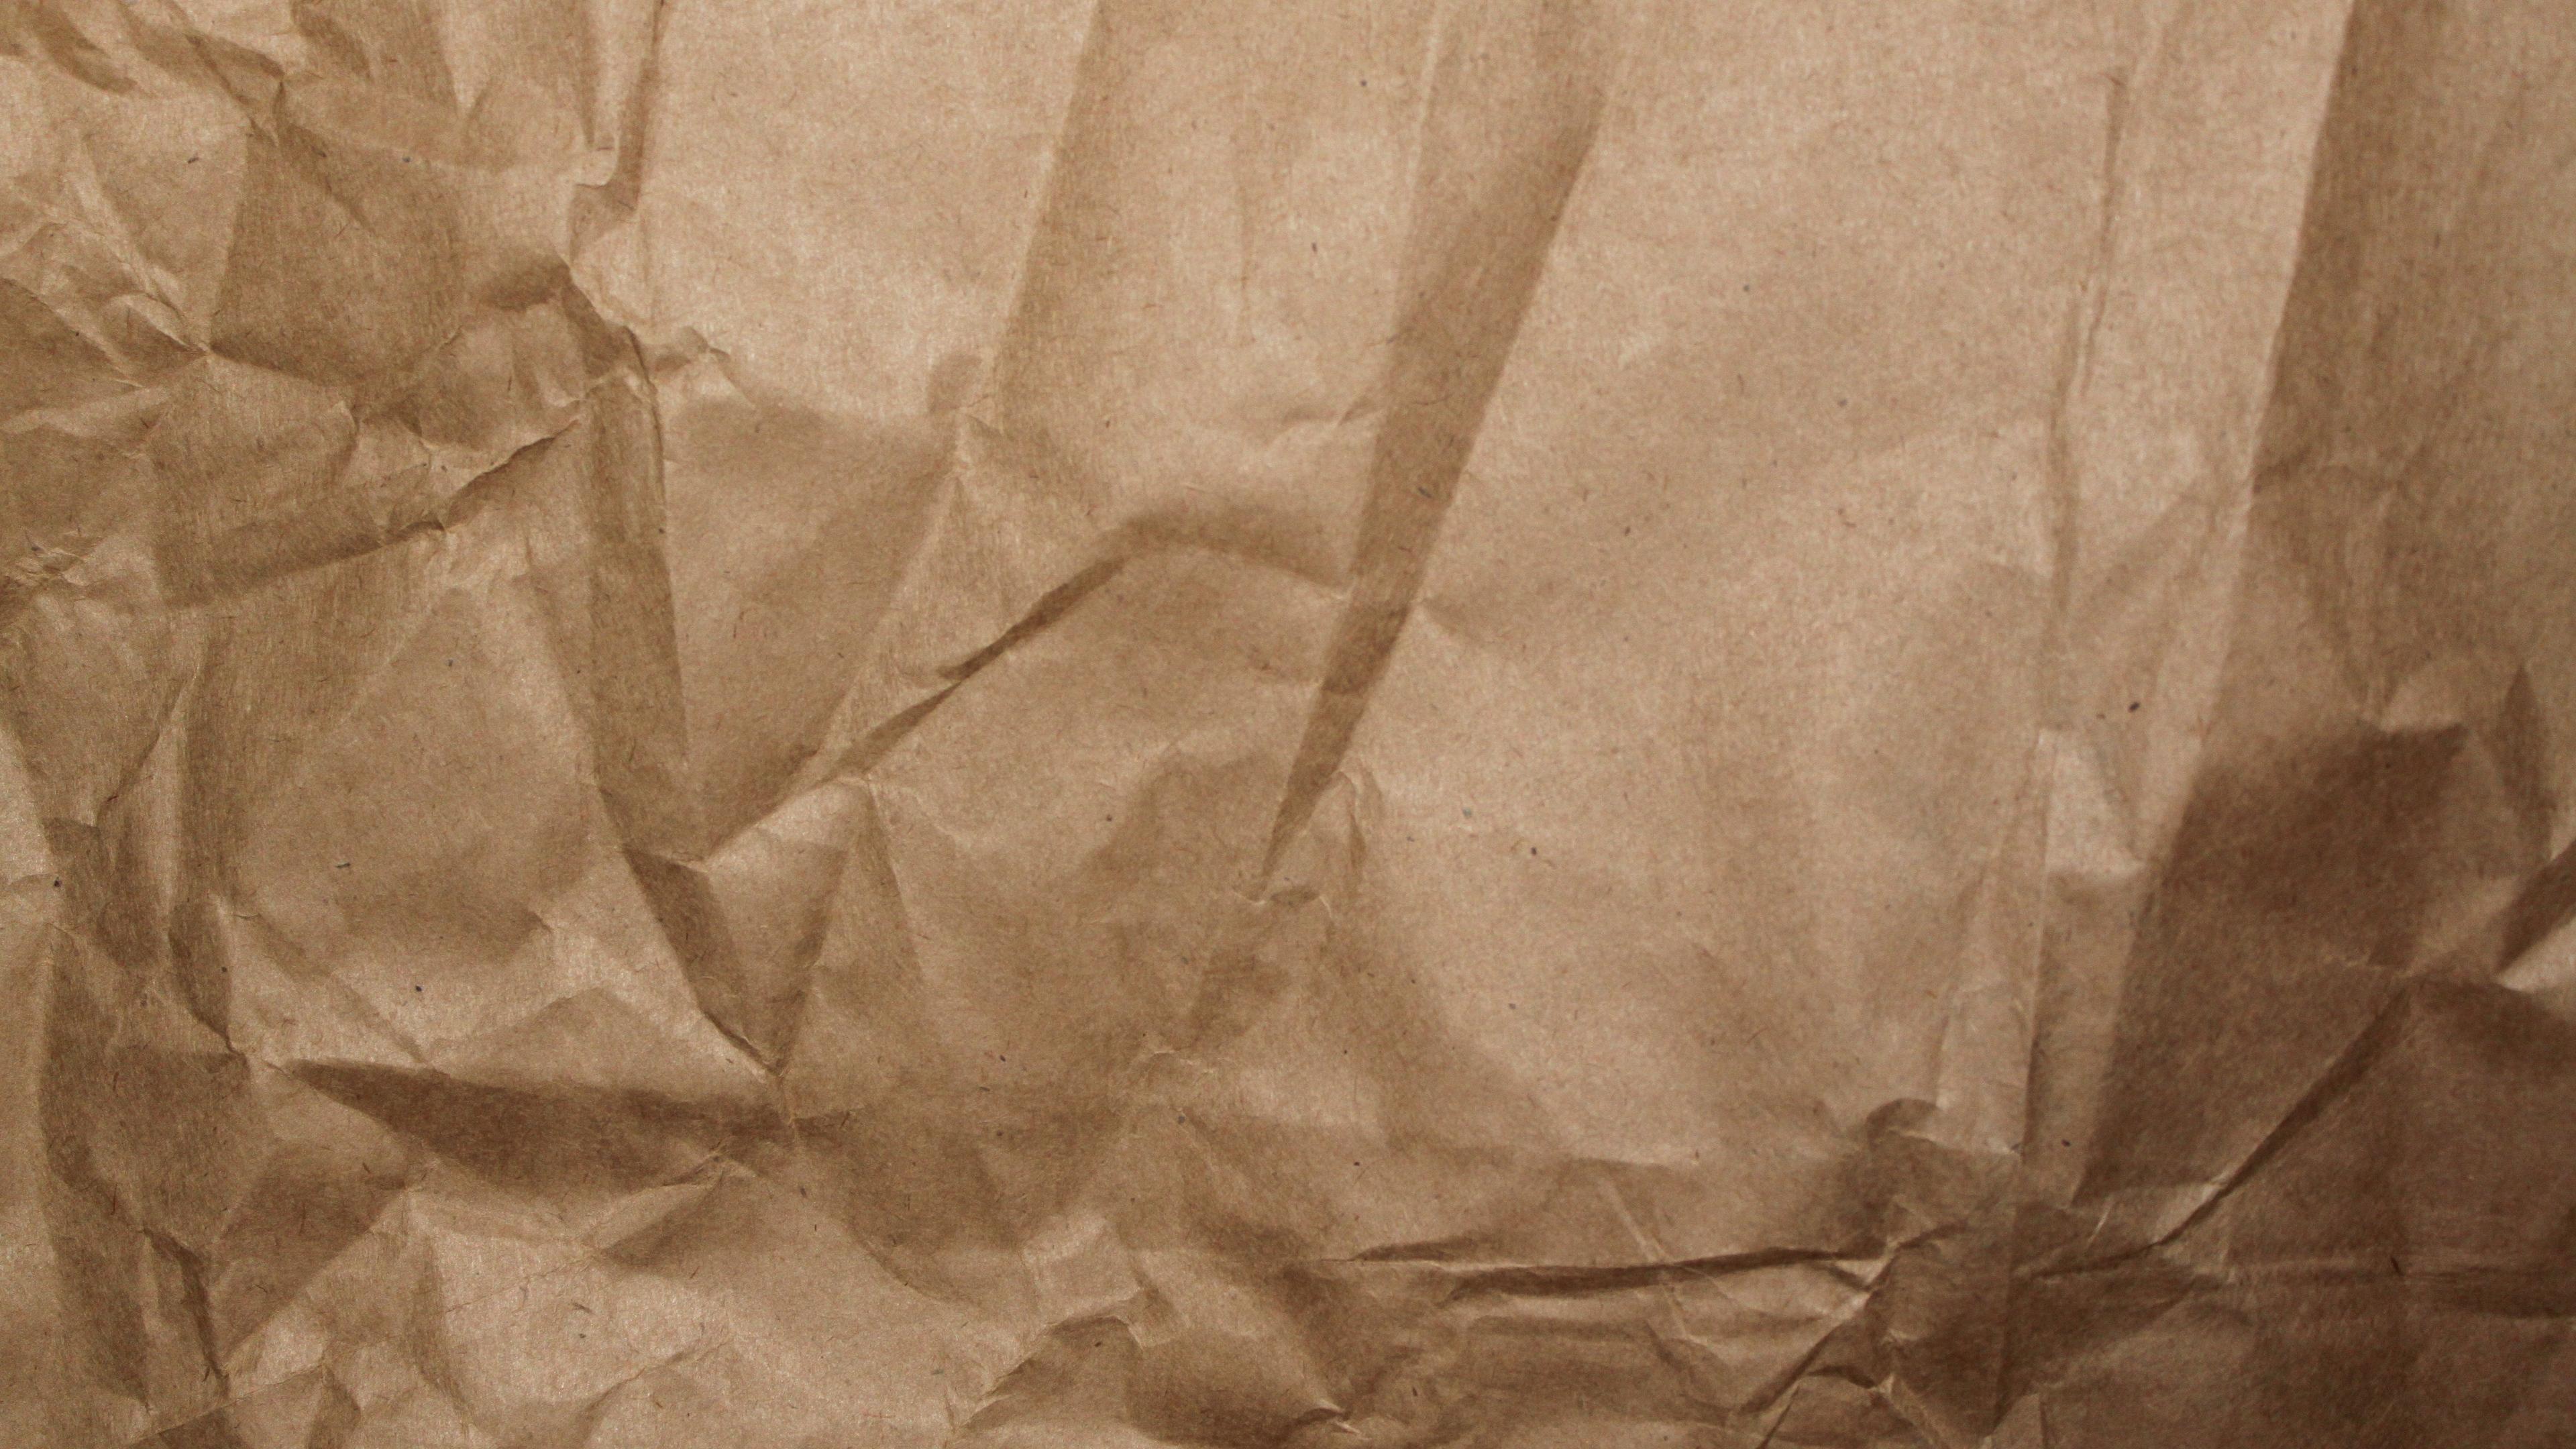 paper crumpled background 4k 1536097817 - paper, crumpled, background 4k - Paper, crumpled, Background